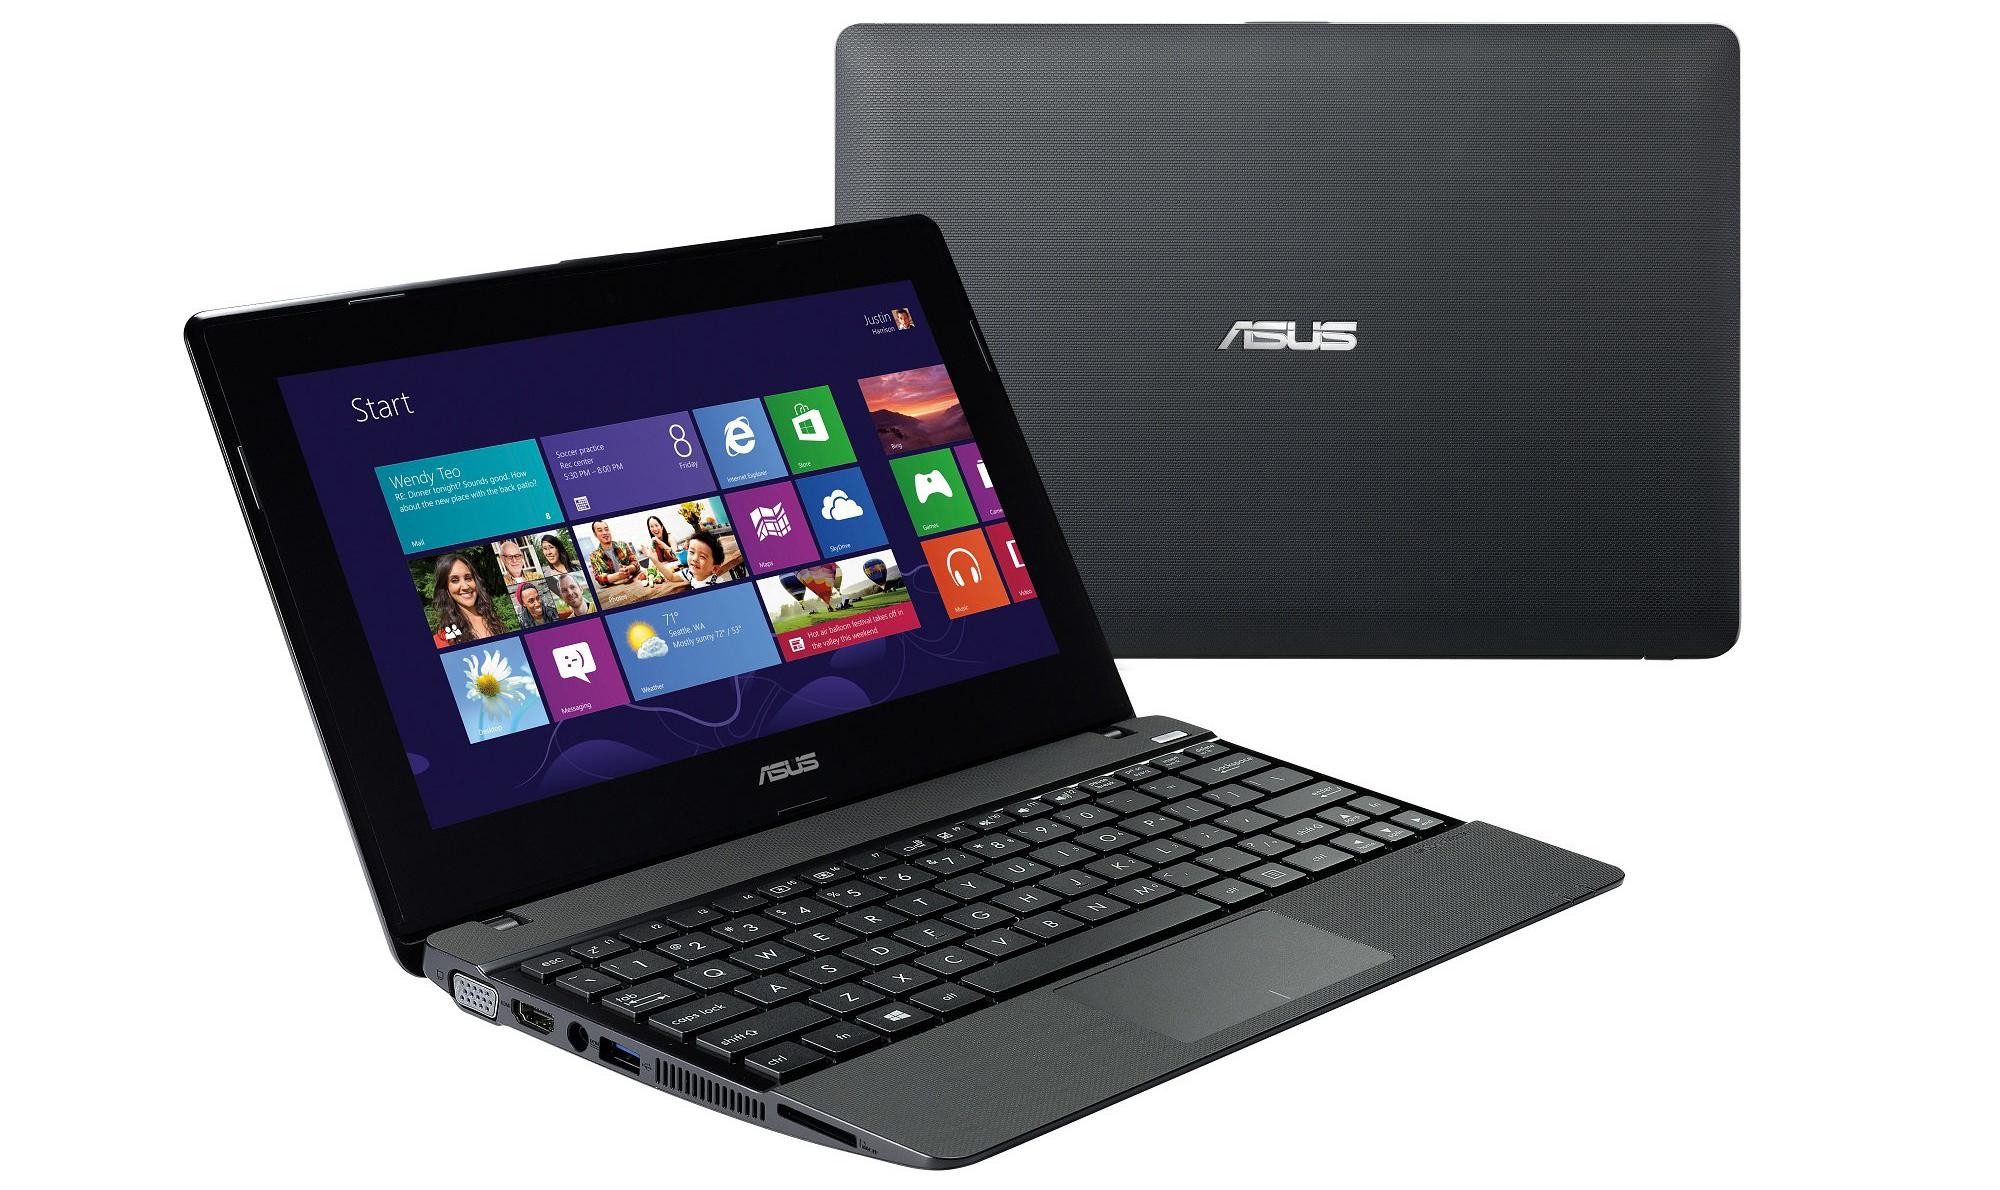 Asus_Ultrabook_X102BA_2.jpg